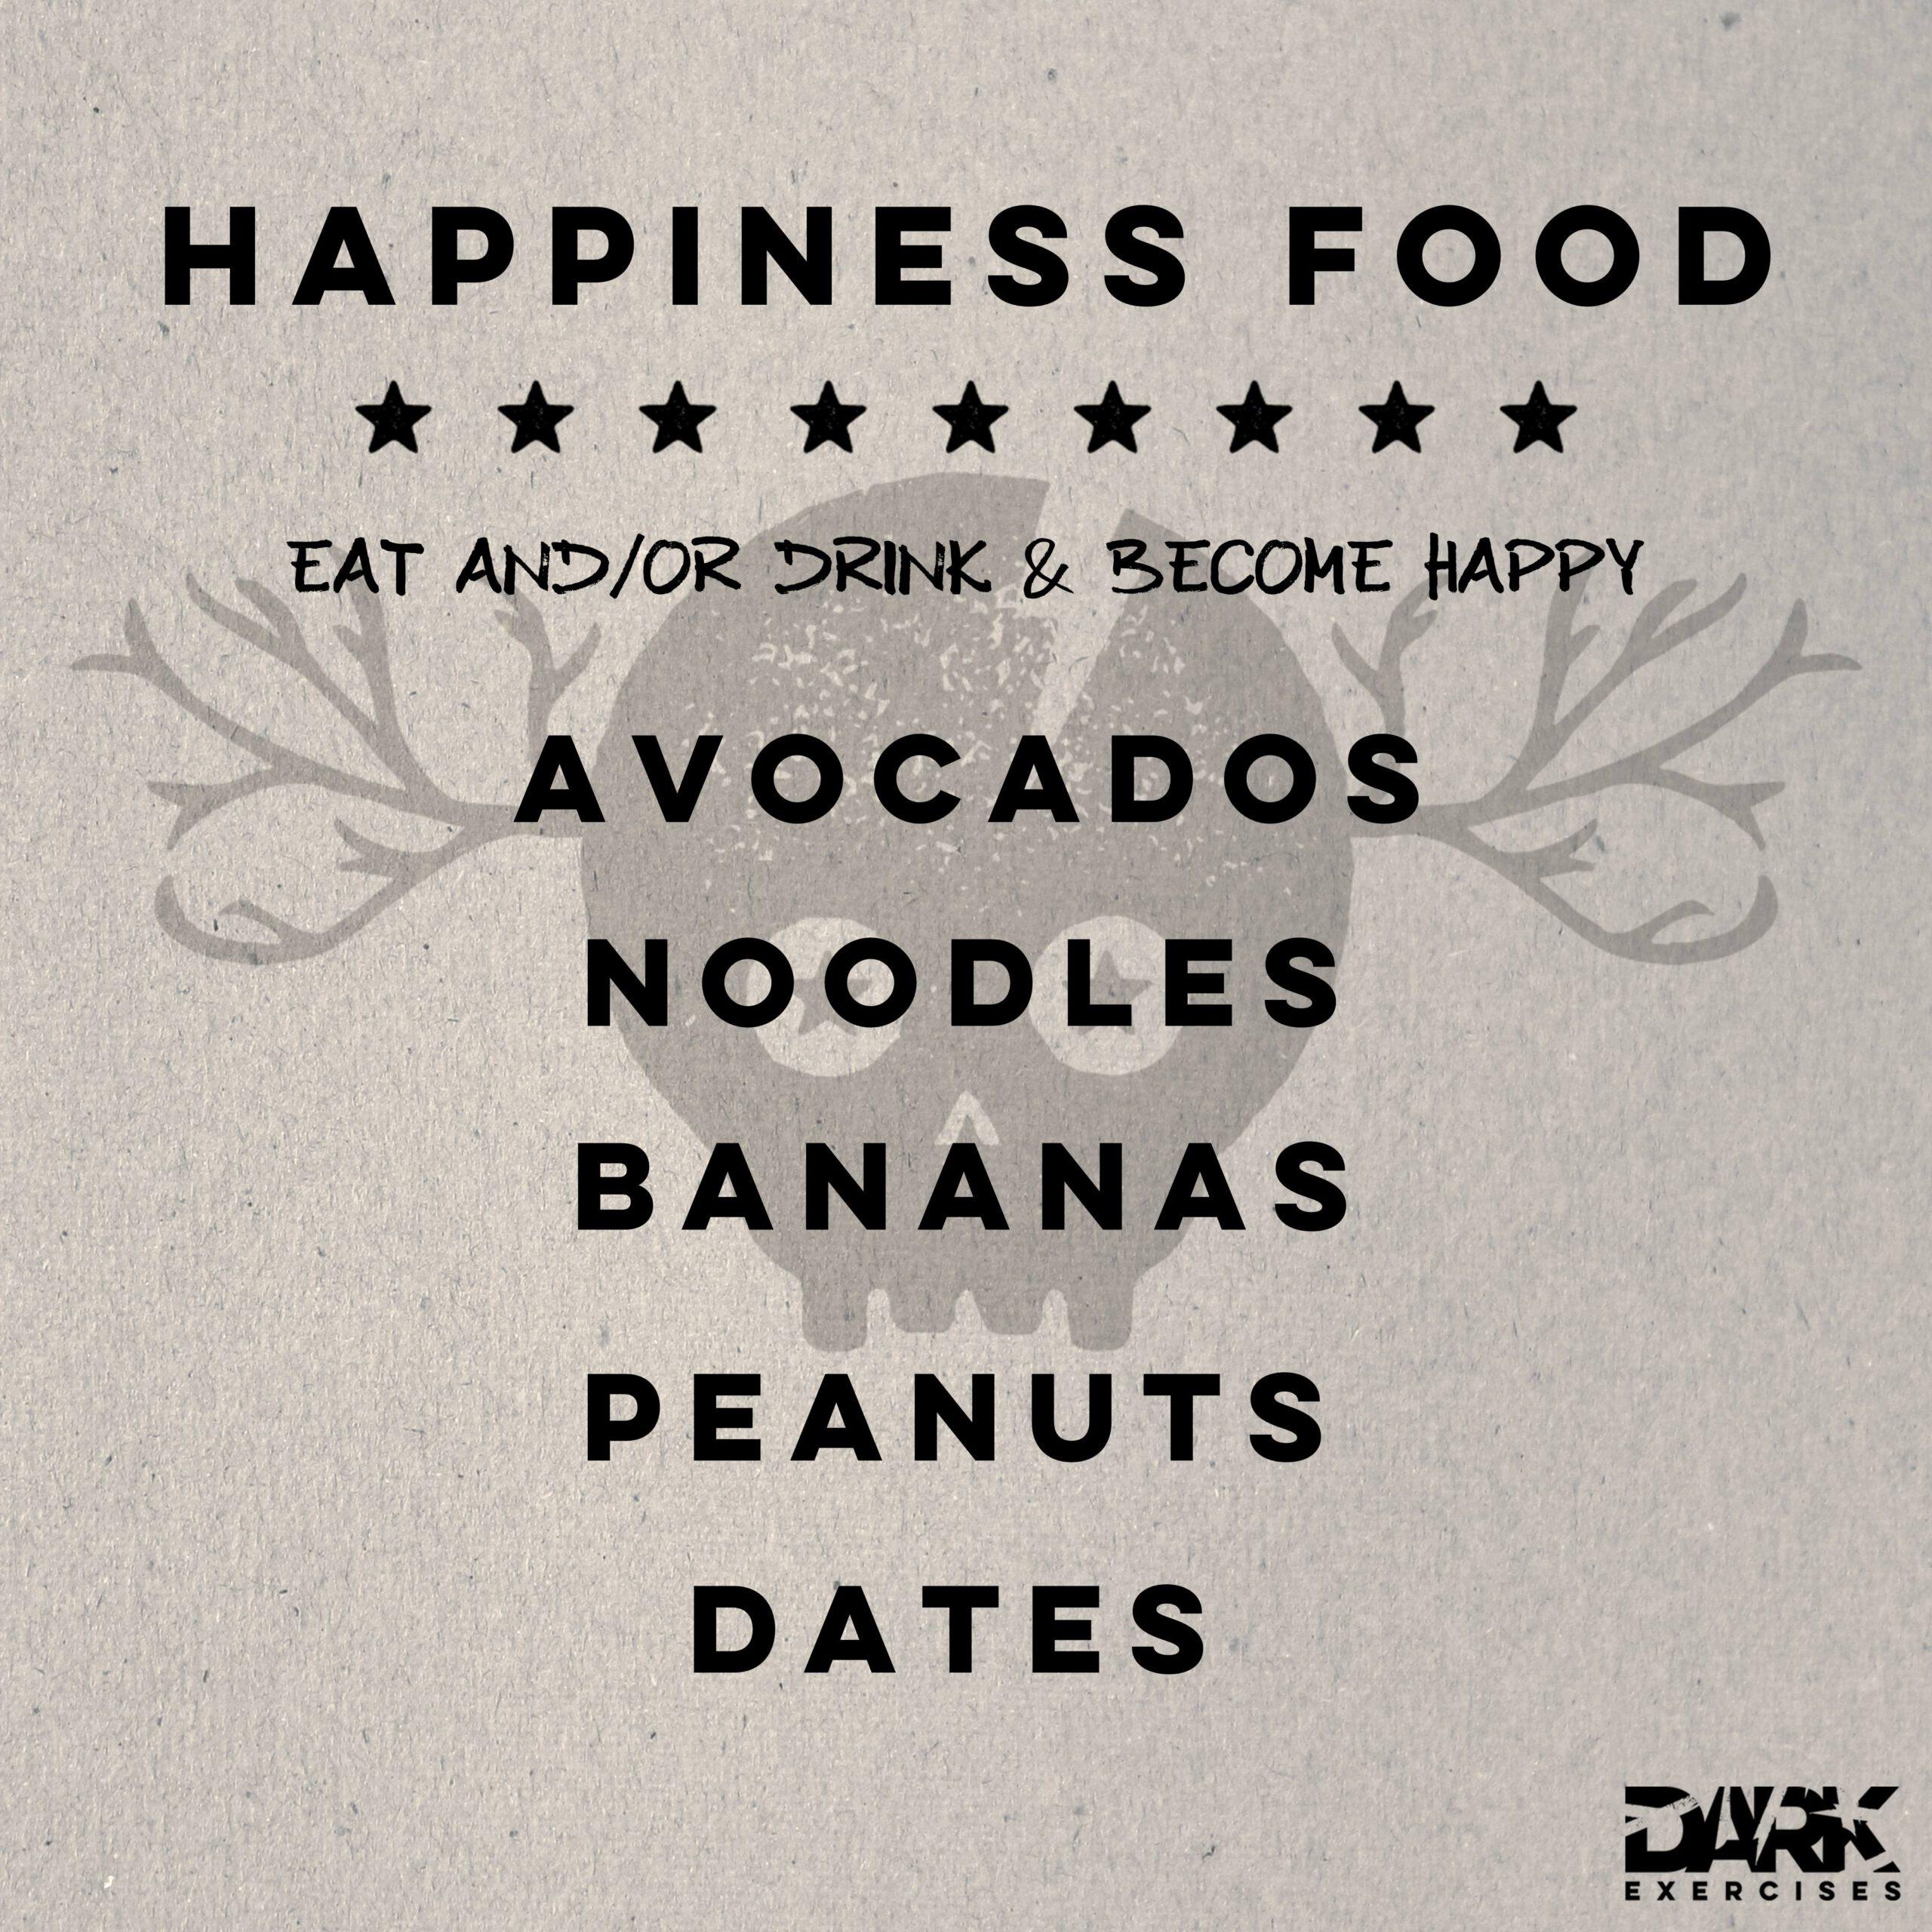 Happiness Food